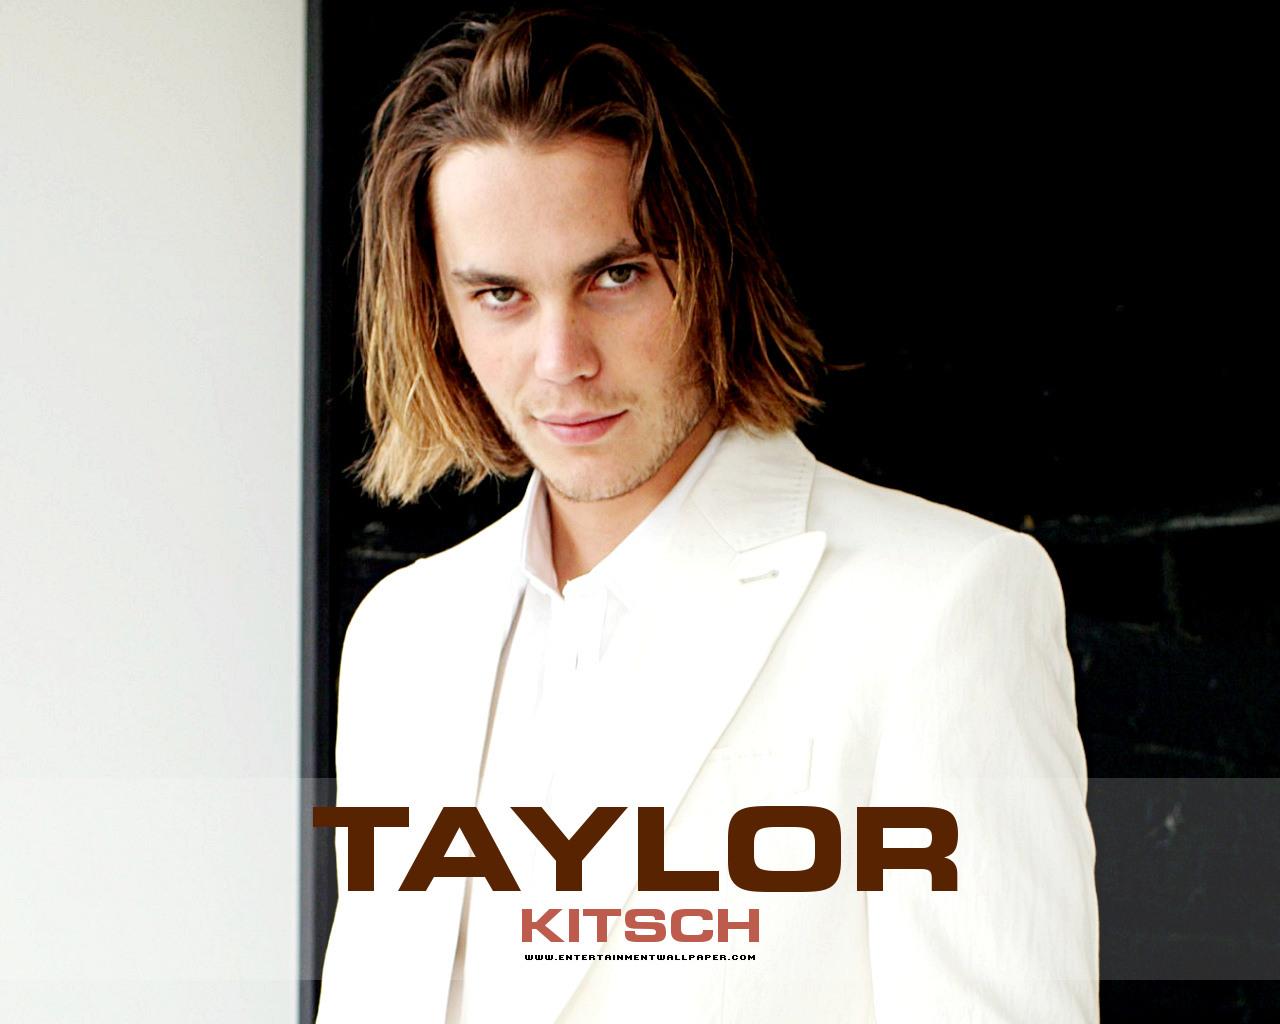 ♥♥♥♥Taylor Kitsch ♥♥♥♥